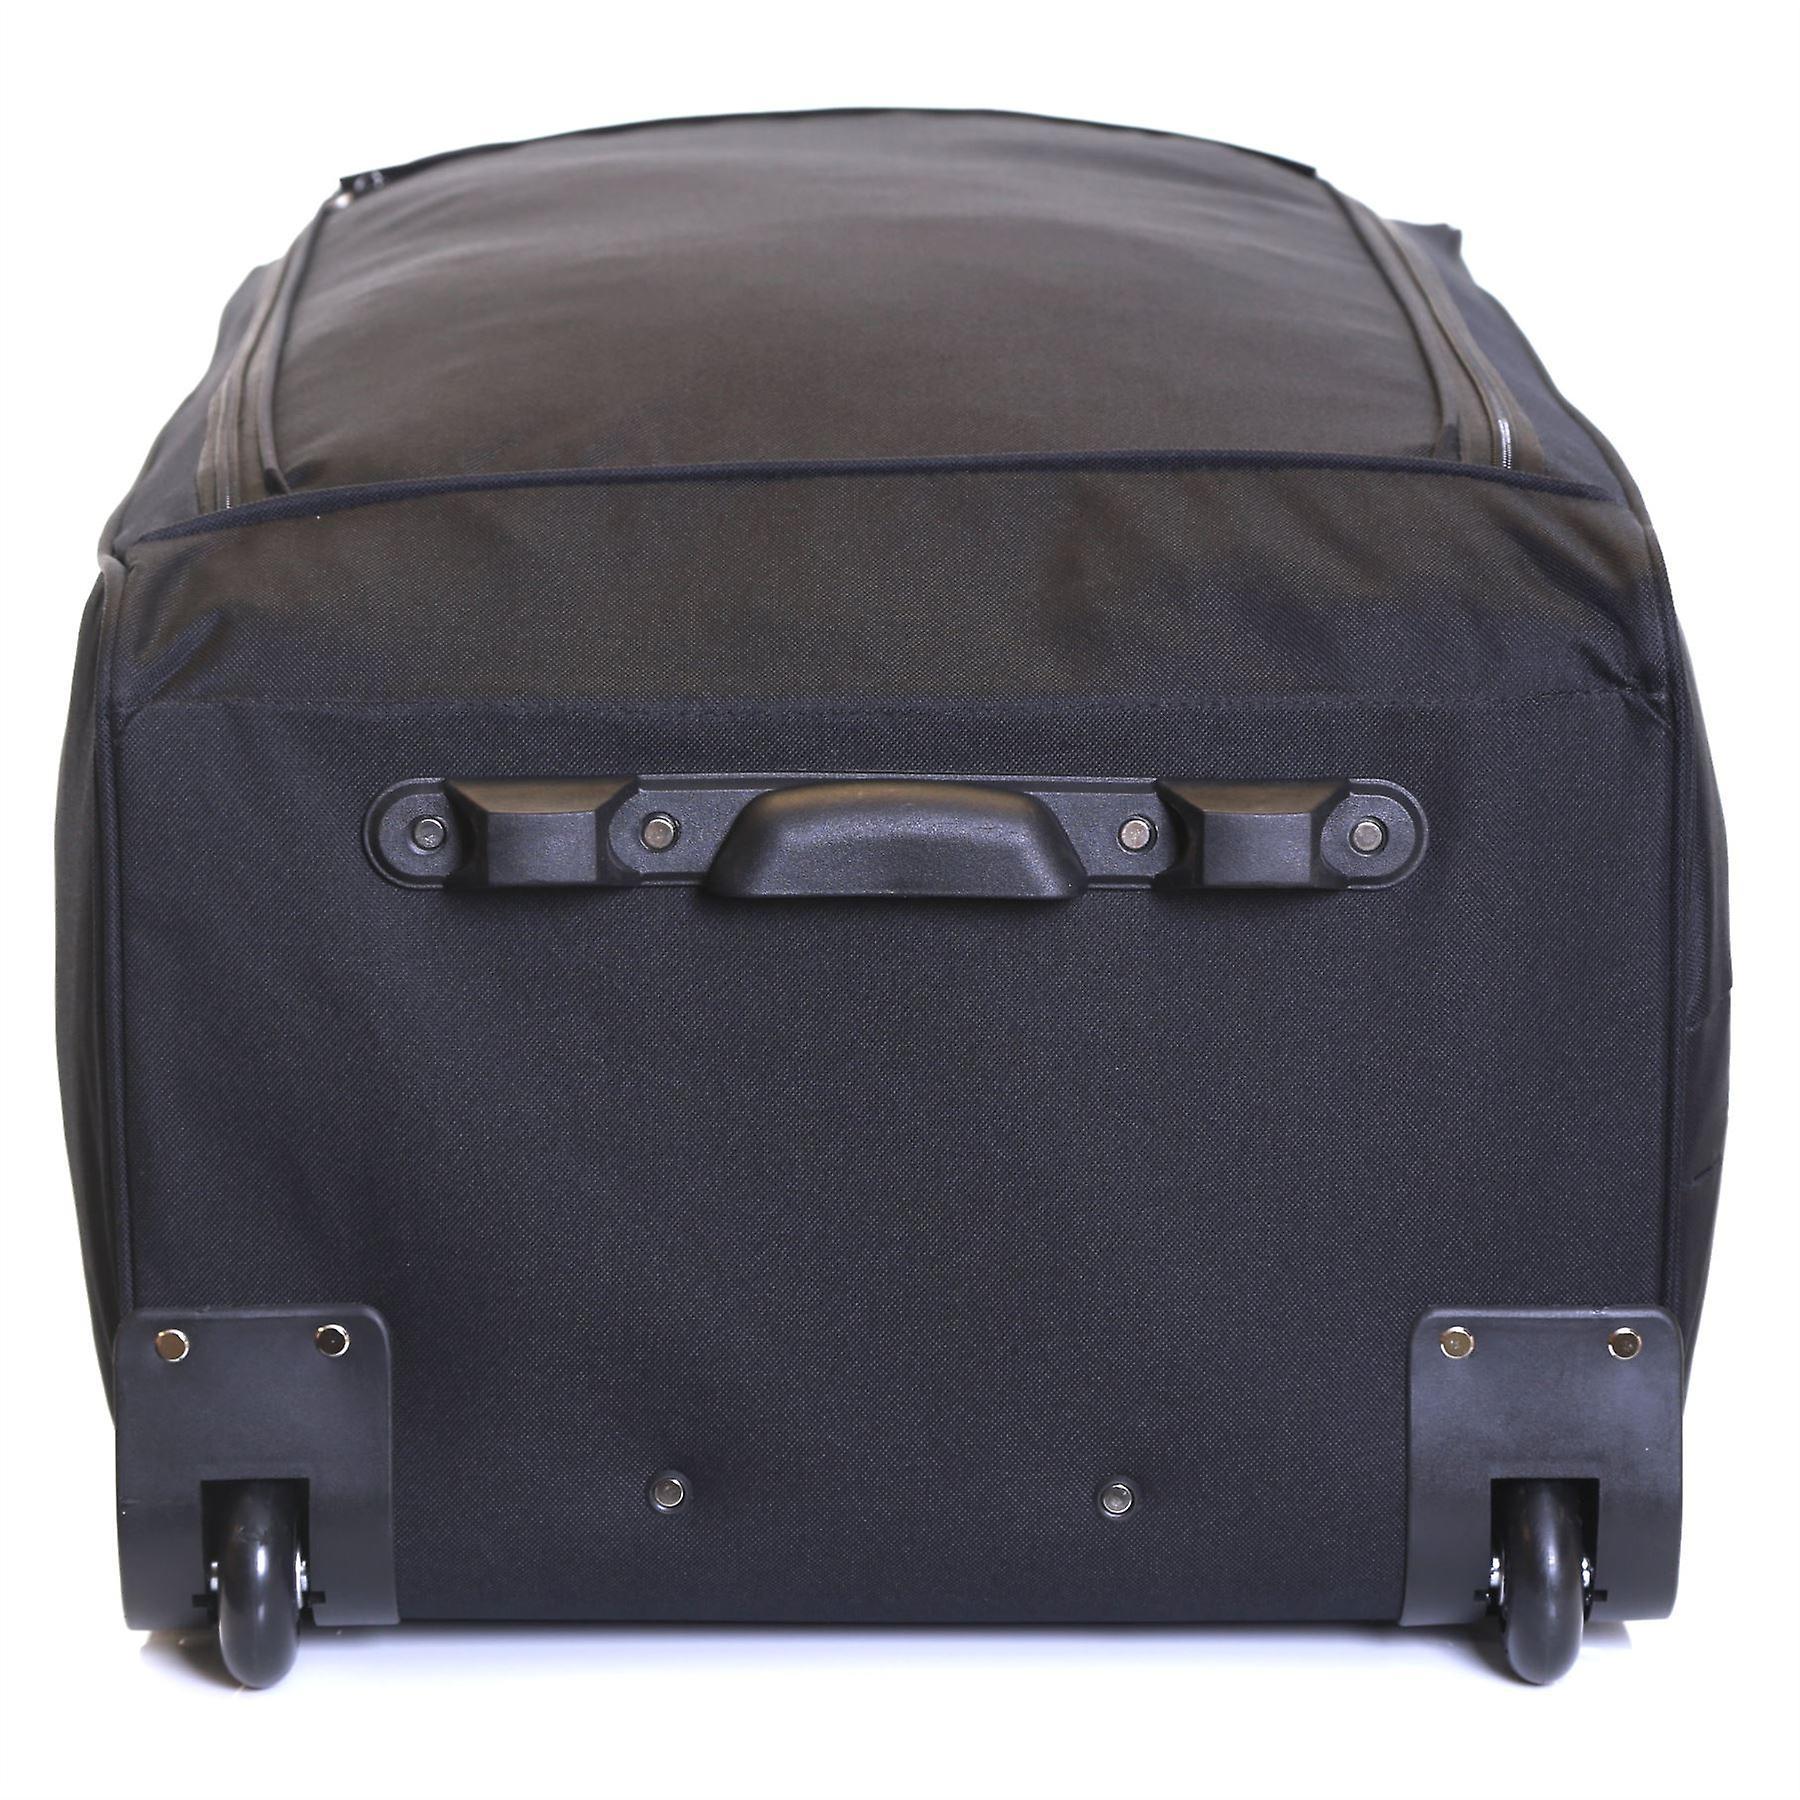 Karabar Alvik Large 28 Inch Suitcase, Black